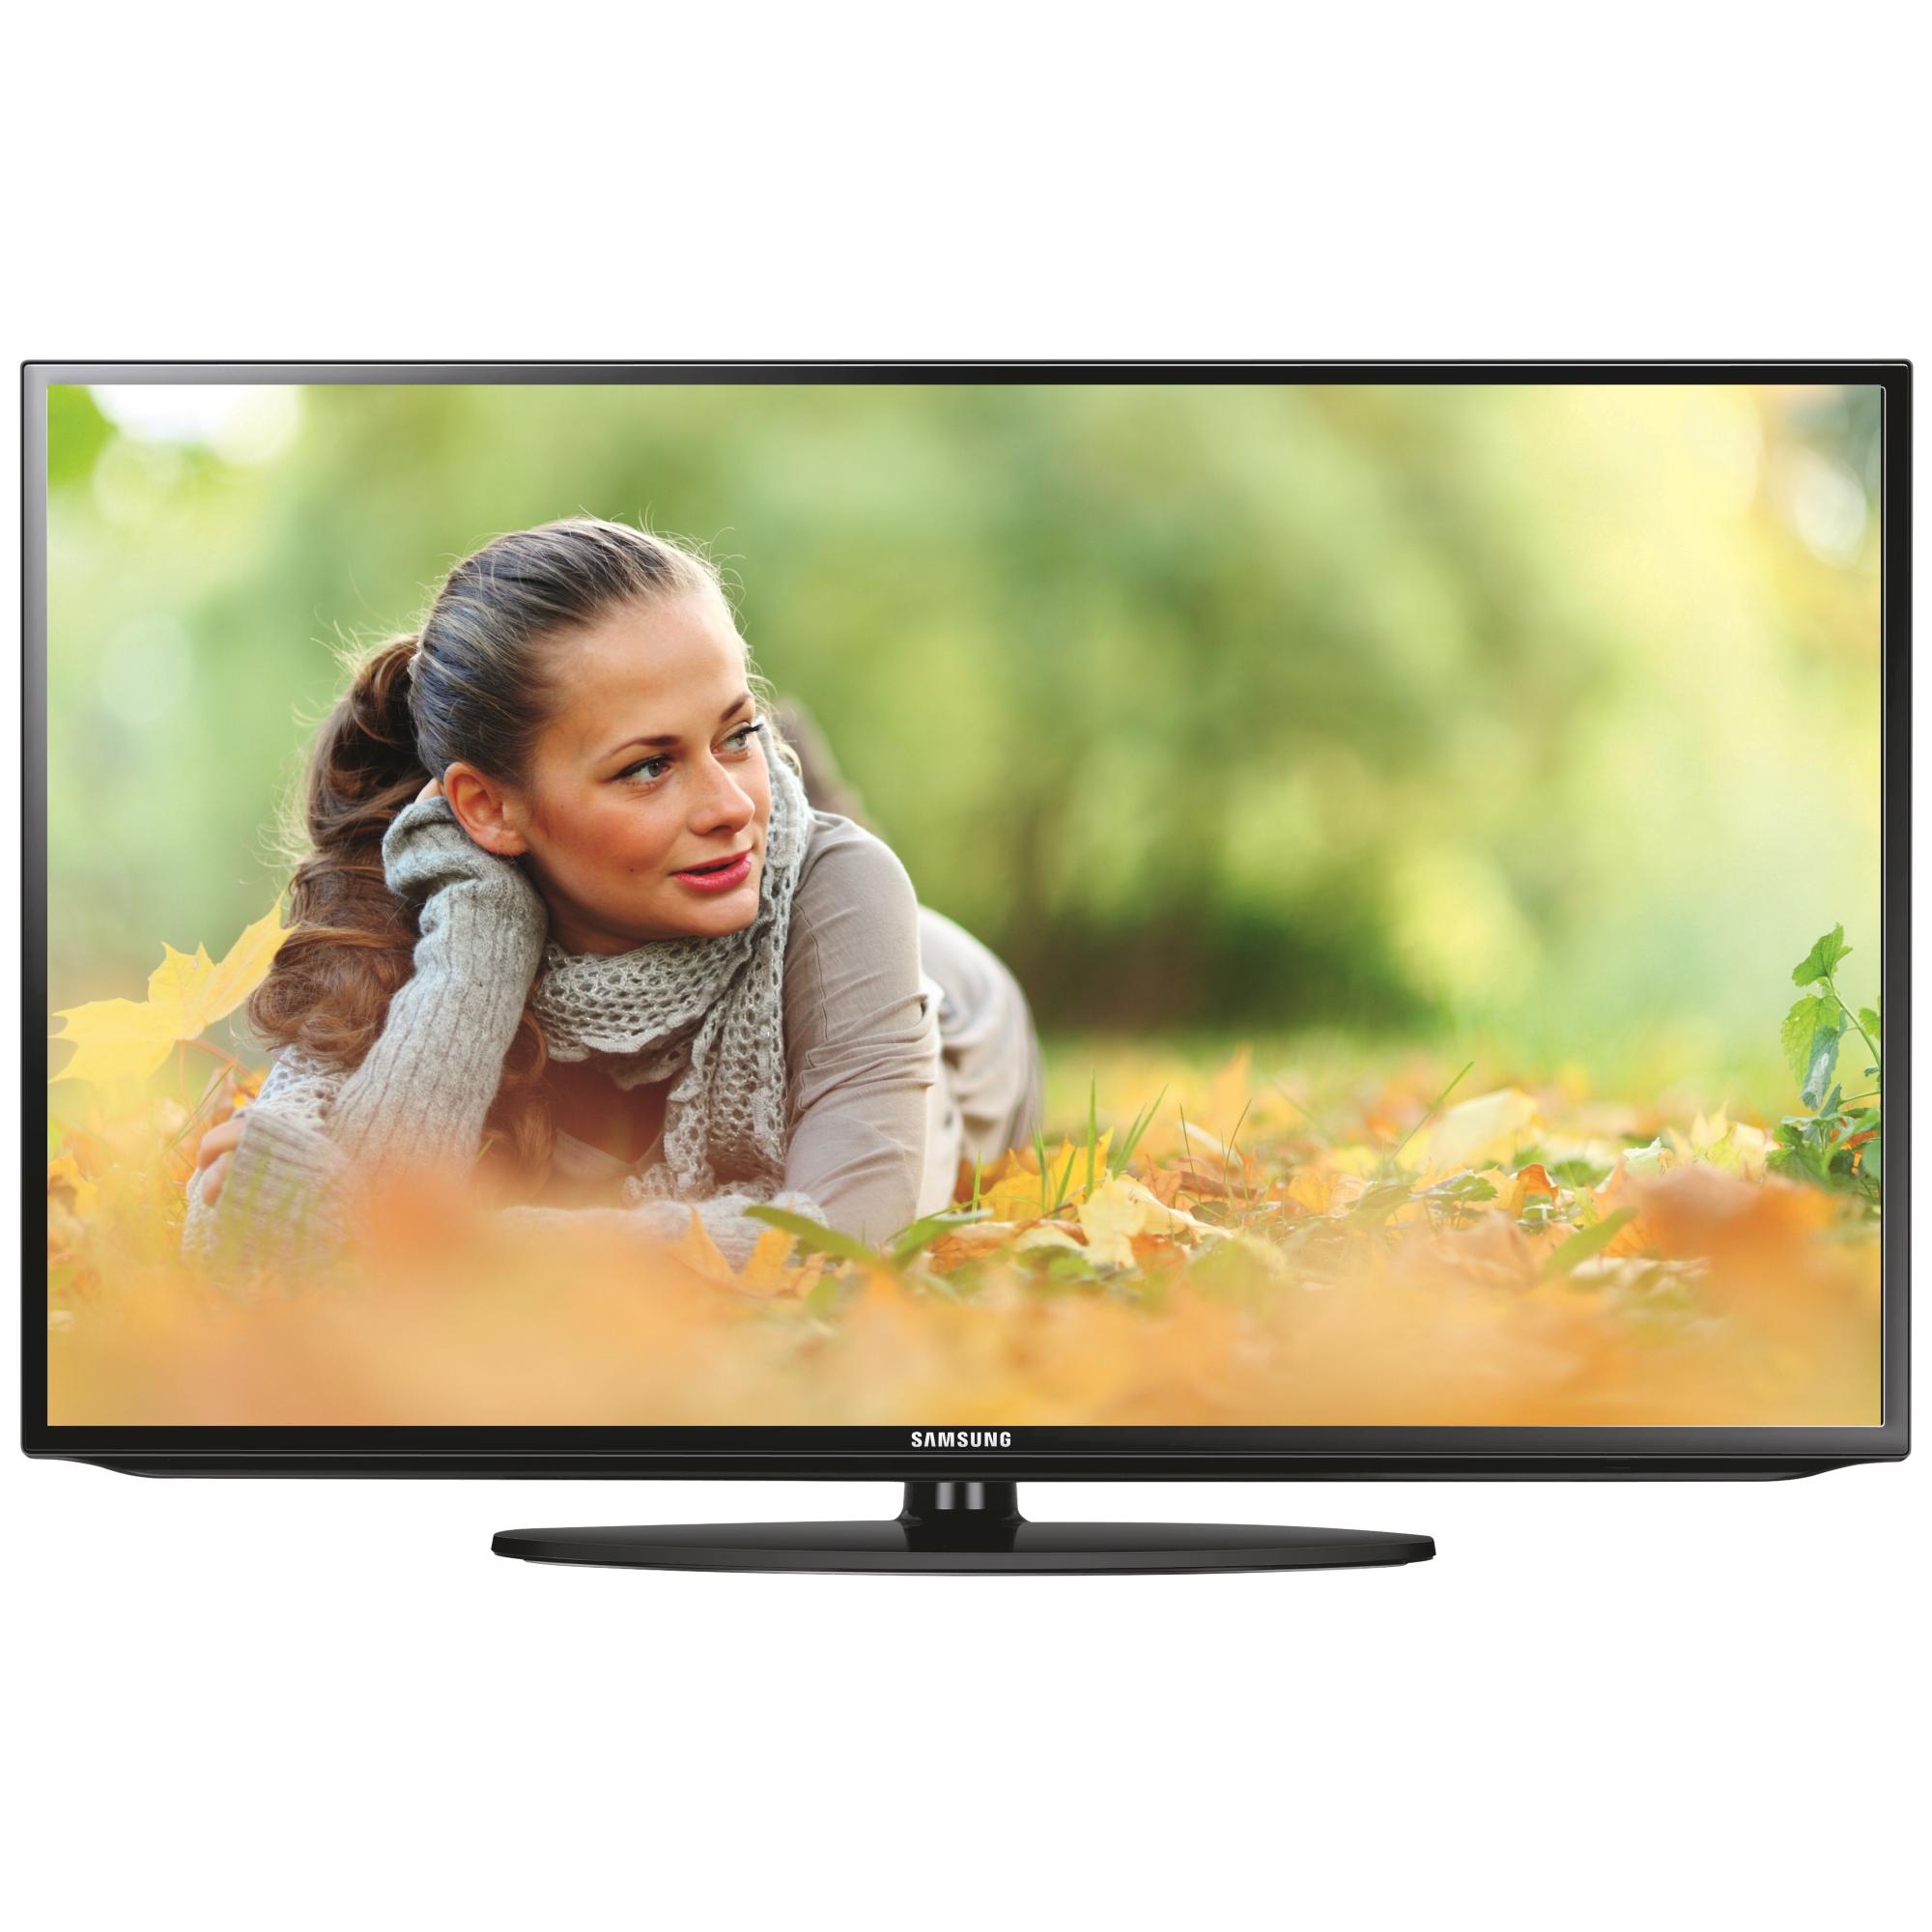 samsung ue50h5373 50 zoll led smart tv fernseher full hd 100 hz usb triple tuner ebay. Black Bedroom Furniture Sets. Home Design Ideas